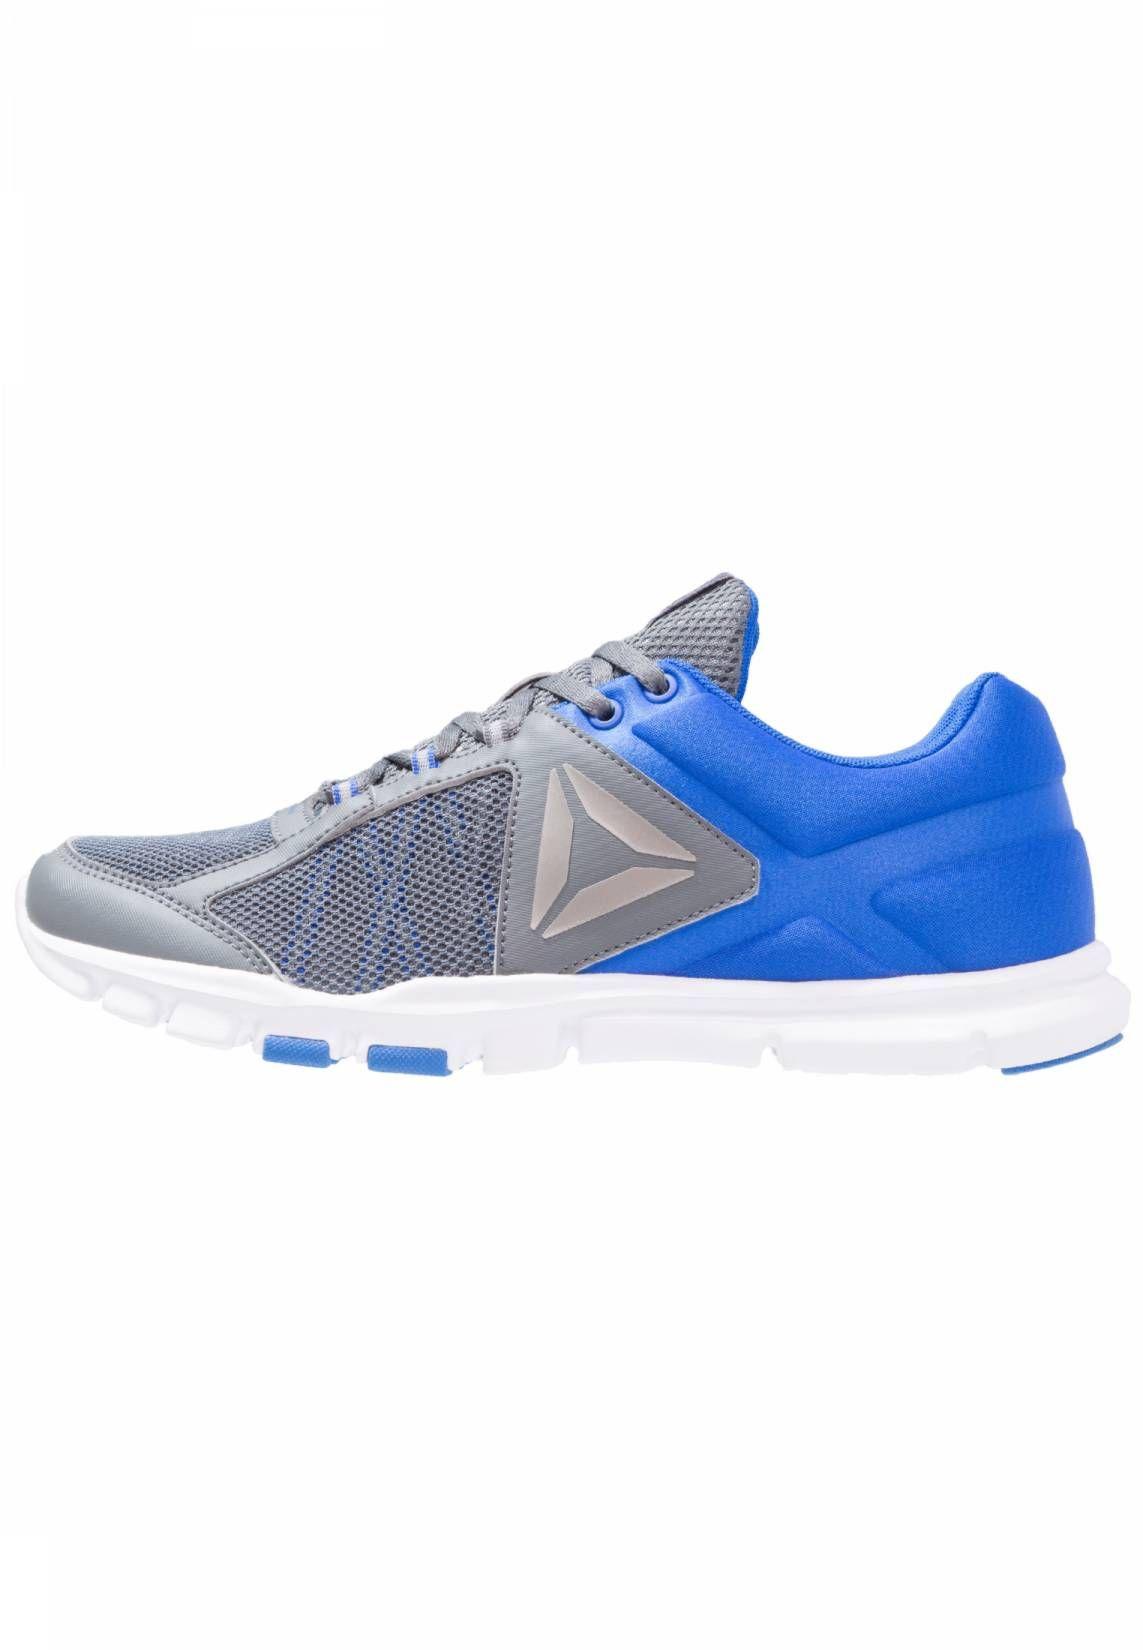 7251f81555b Reebok. YOURFLEX TRAIN 9.0 MT - Sportschoenen - alloy/blue.  materiaalverwerking:mesh